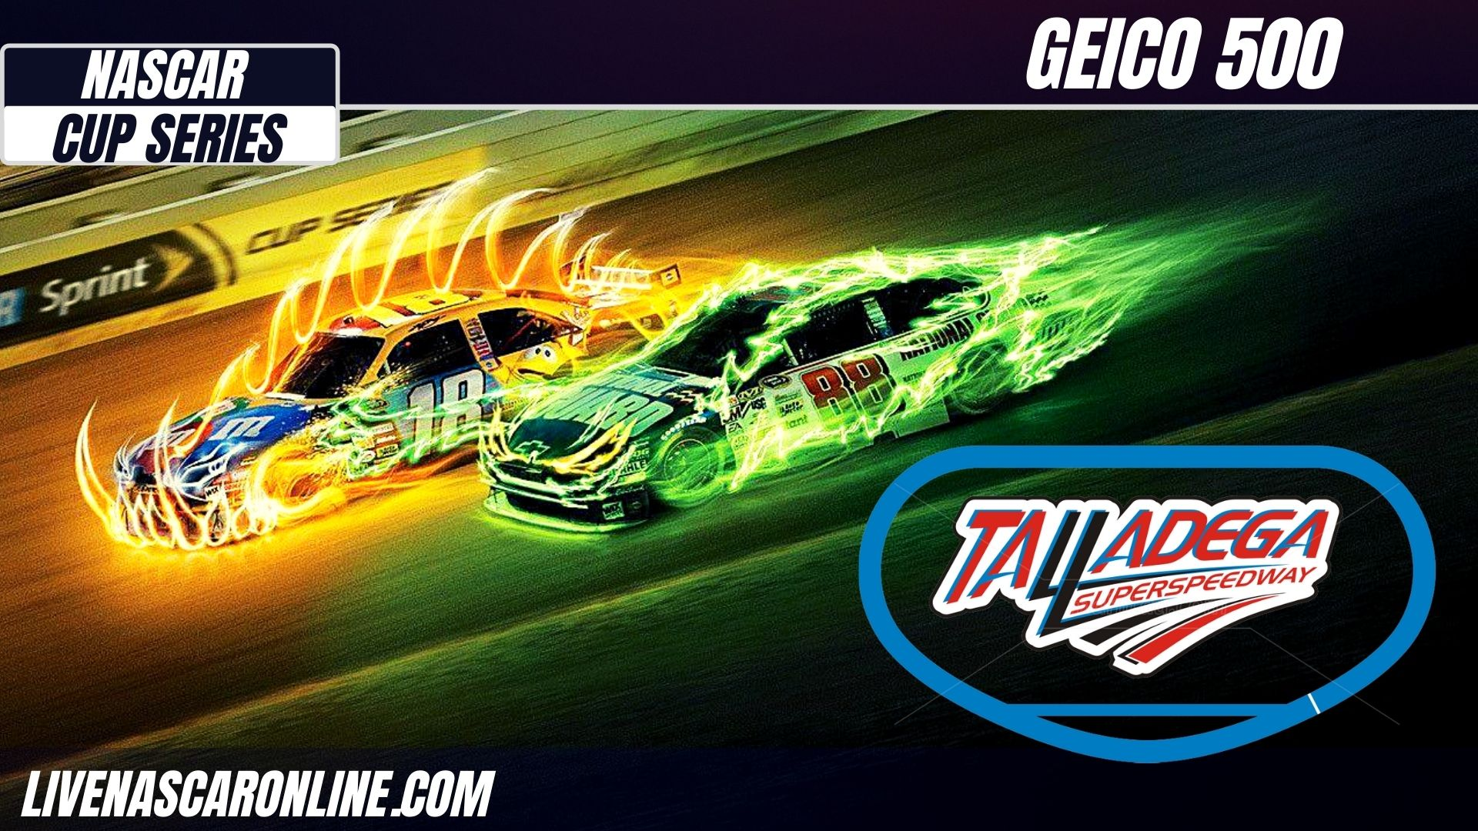 GEICO 500 at Talladega Live Stream 2021